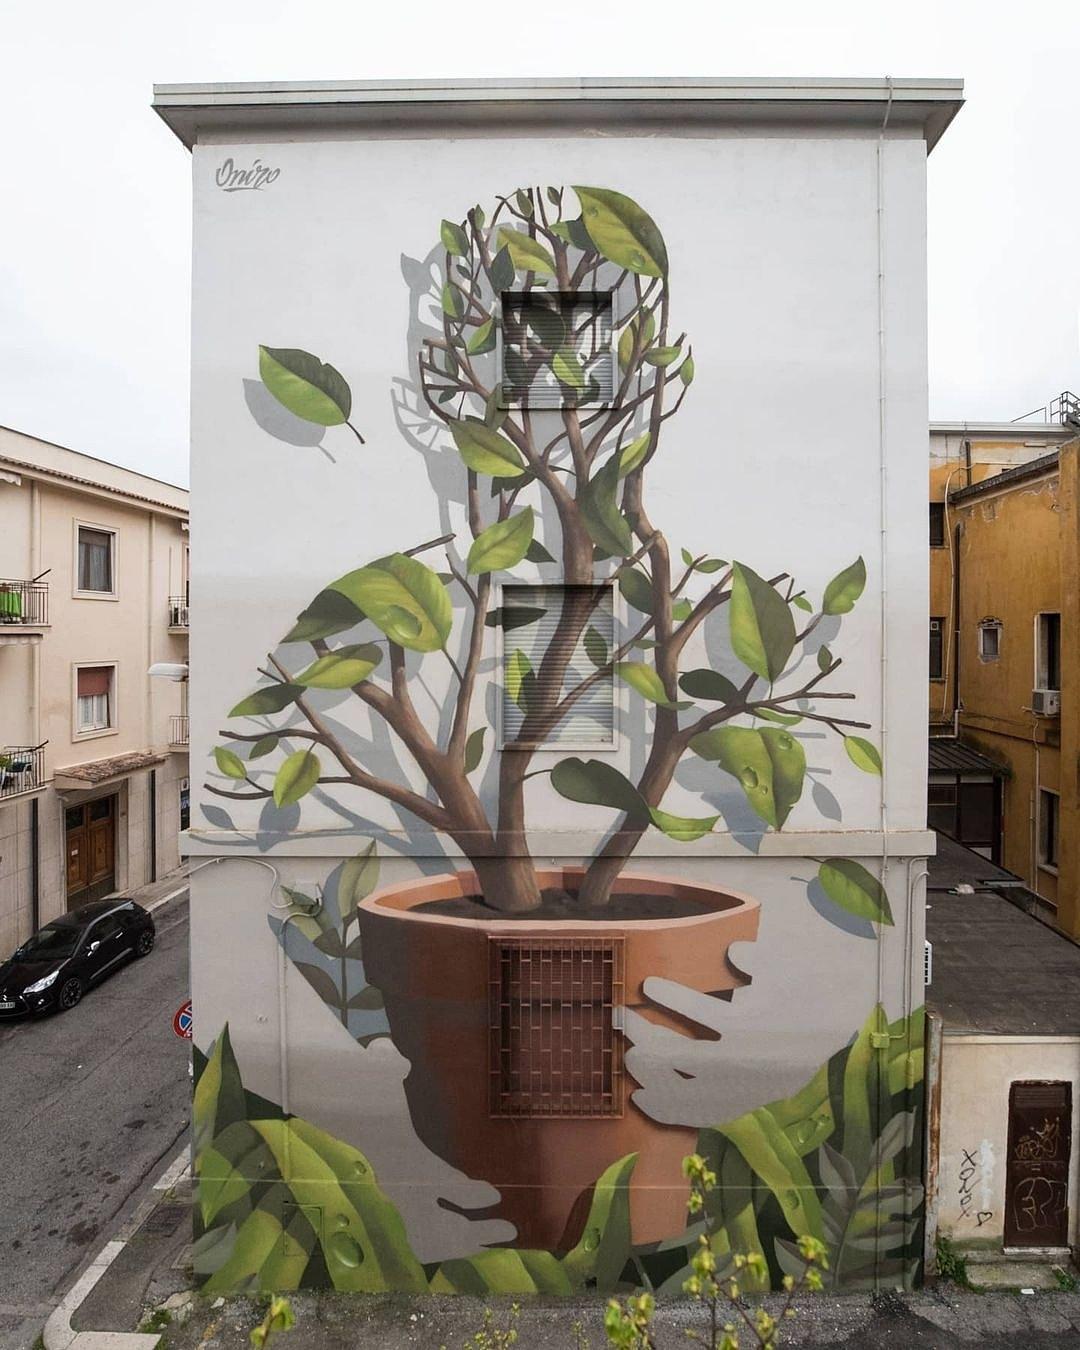 Oniro @ Cassino, Italy